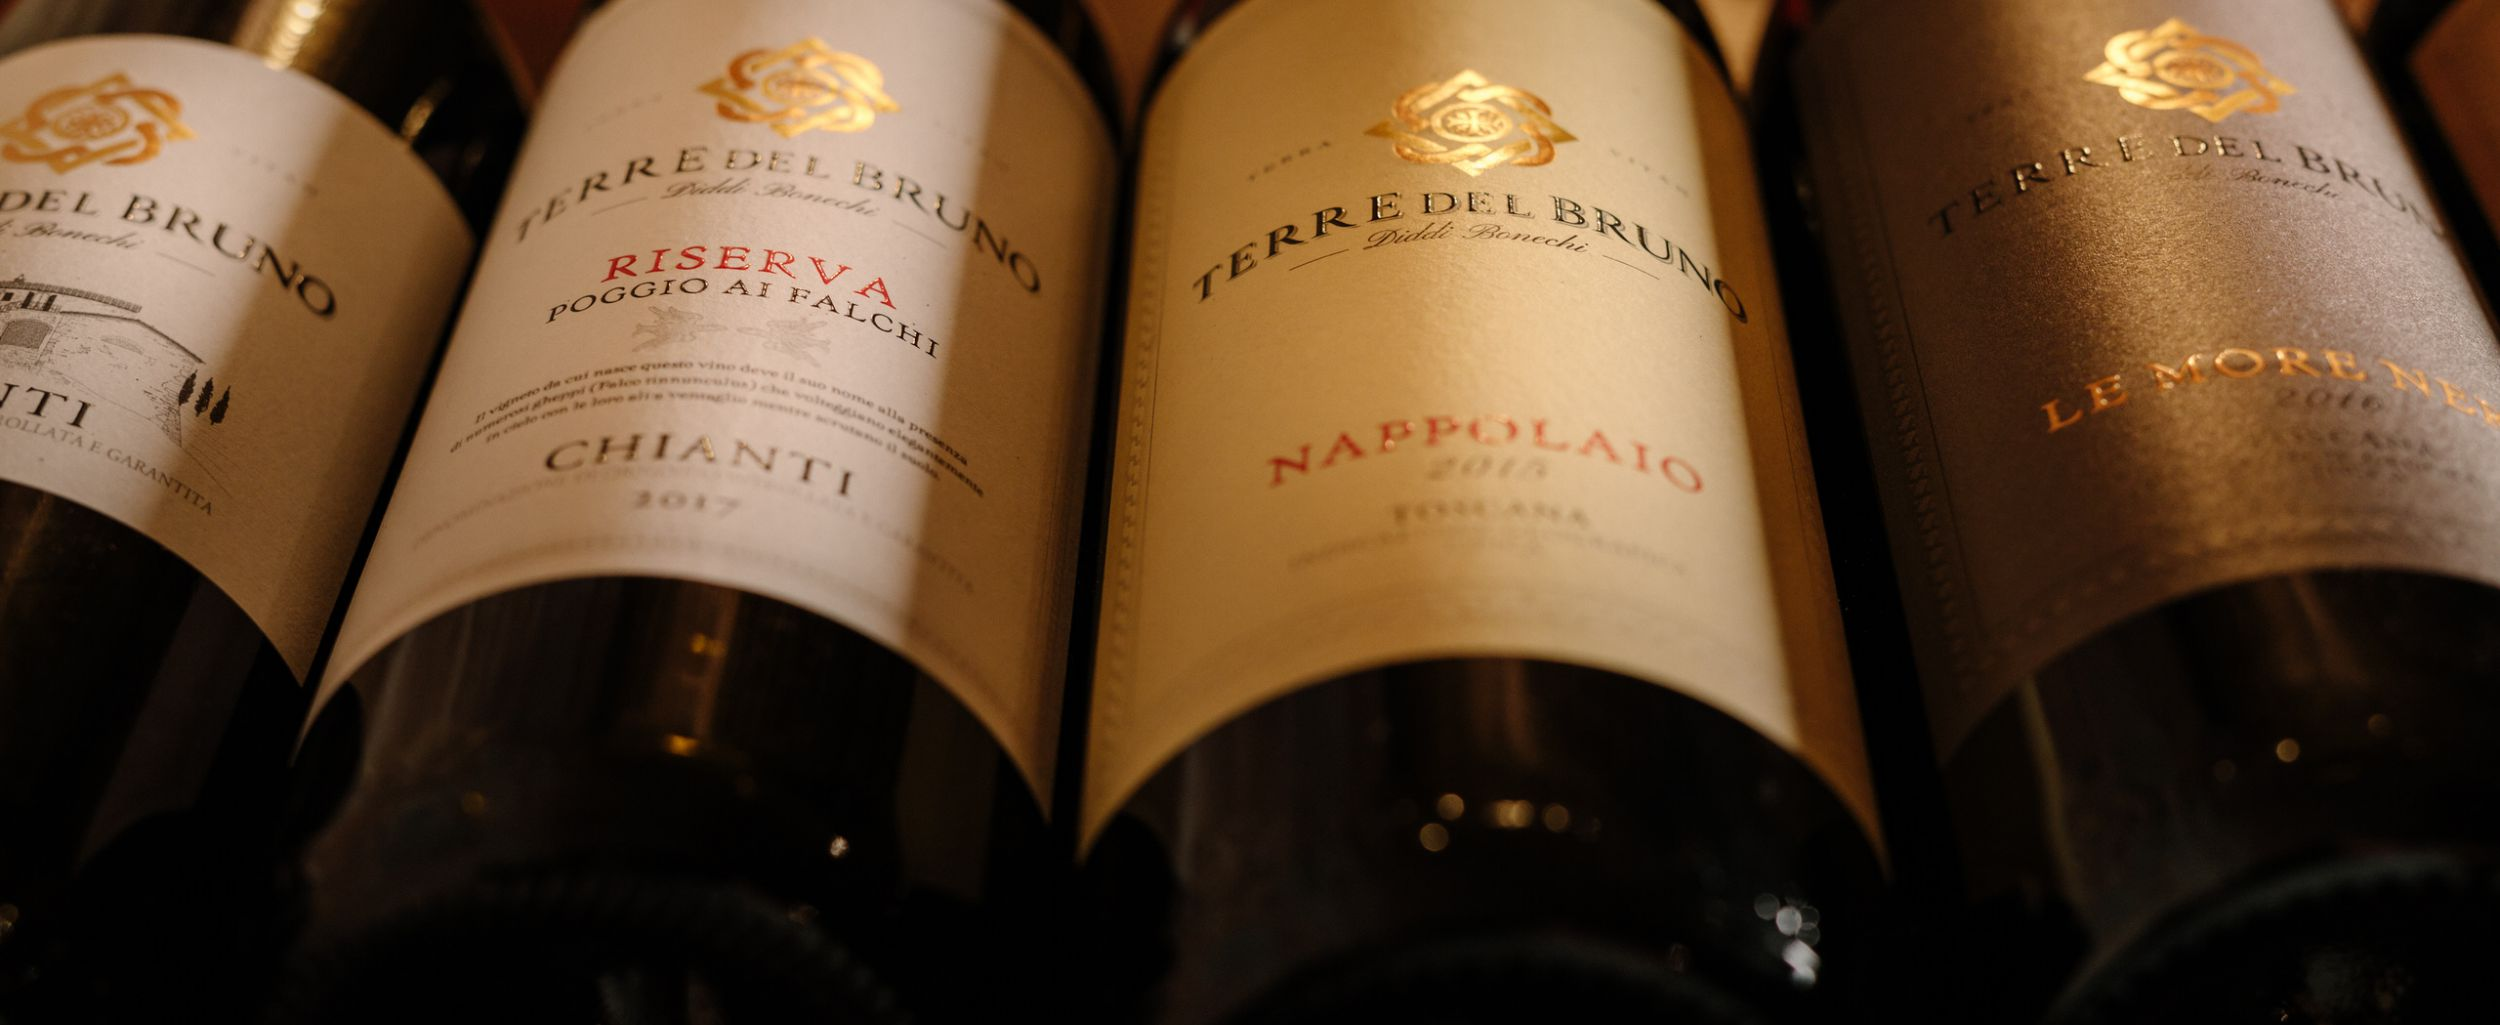 Terre del Bruno Wines